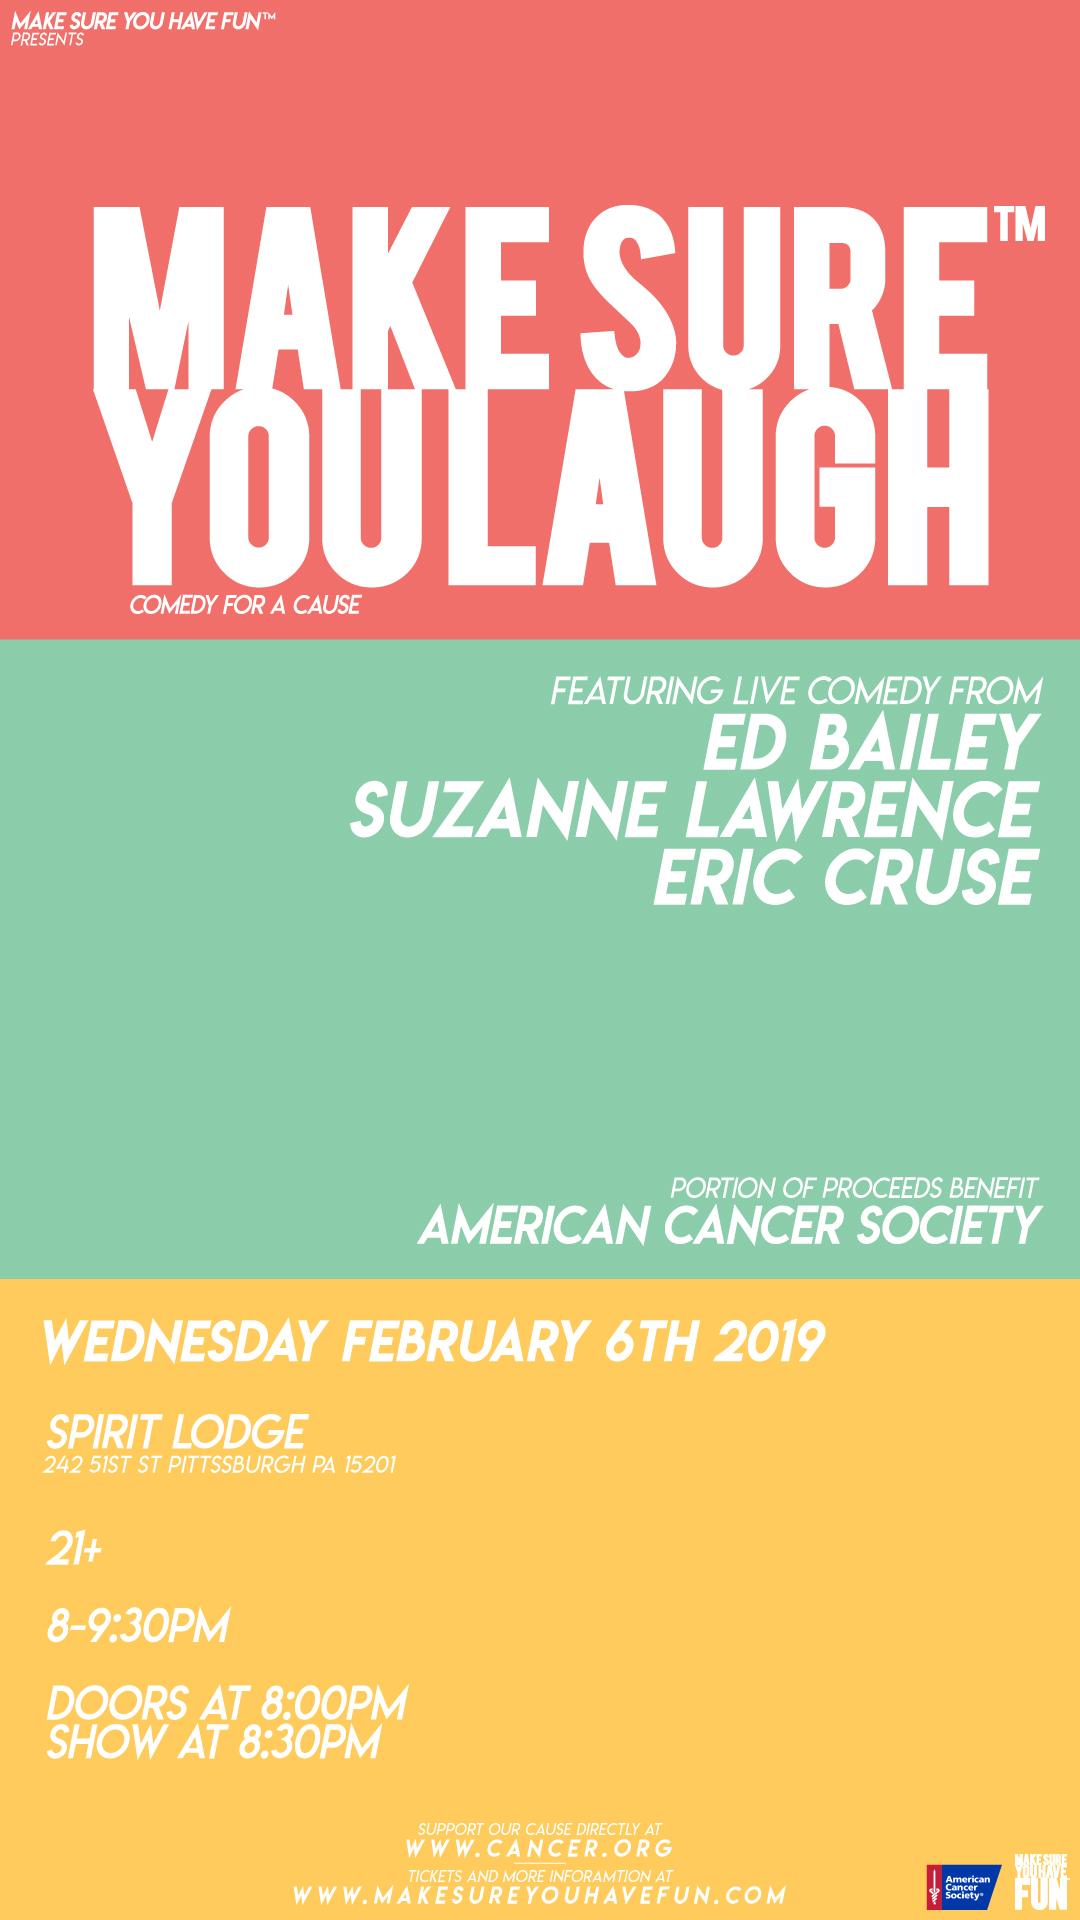 Make-Sure-You-Laugh-February-2019-IG-Story-Flyer.jpg